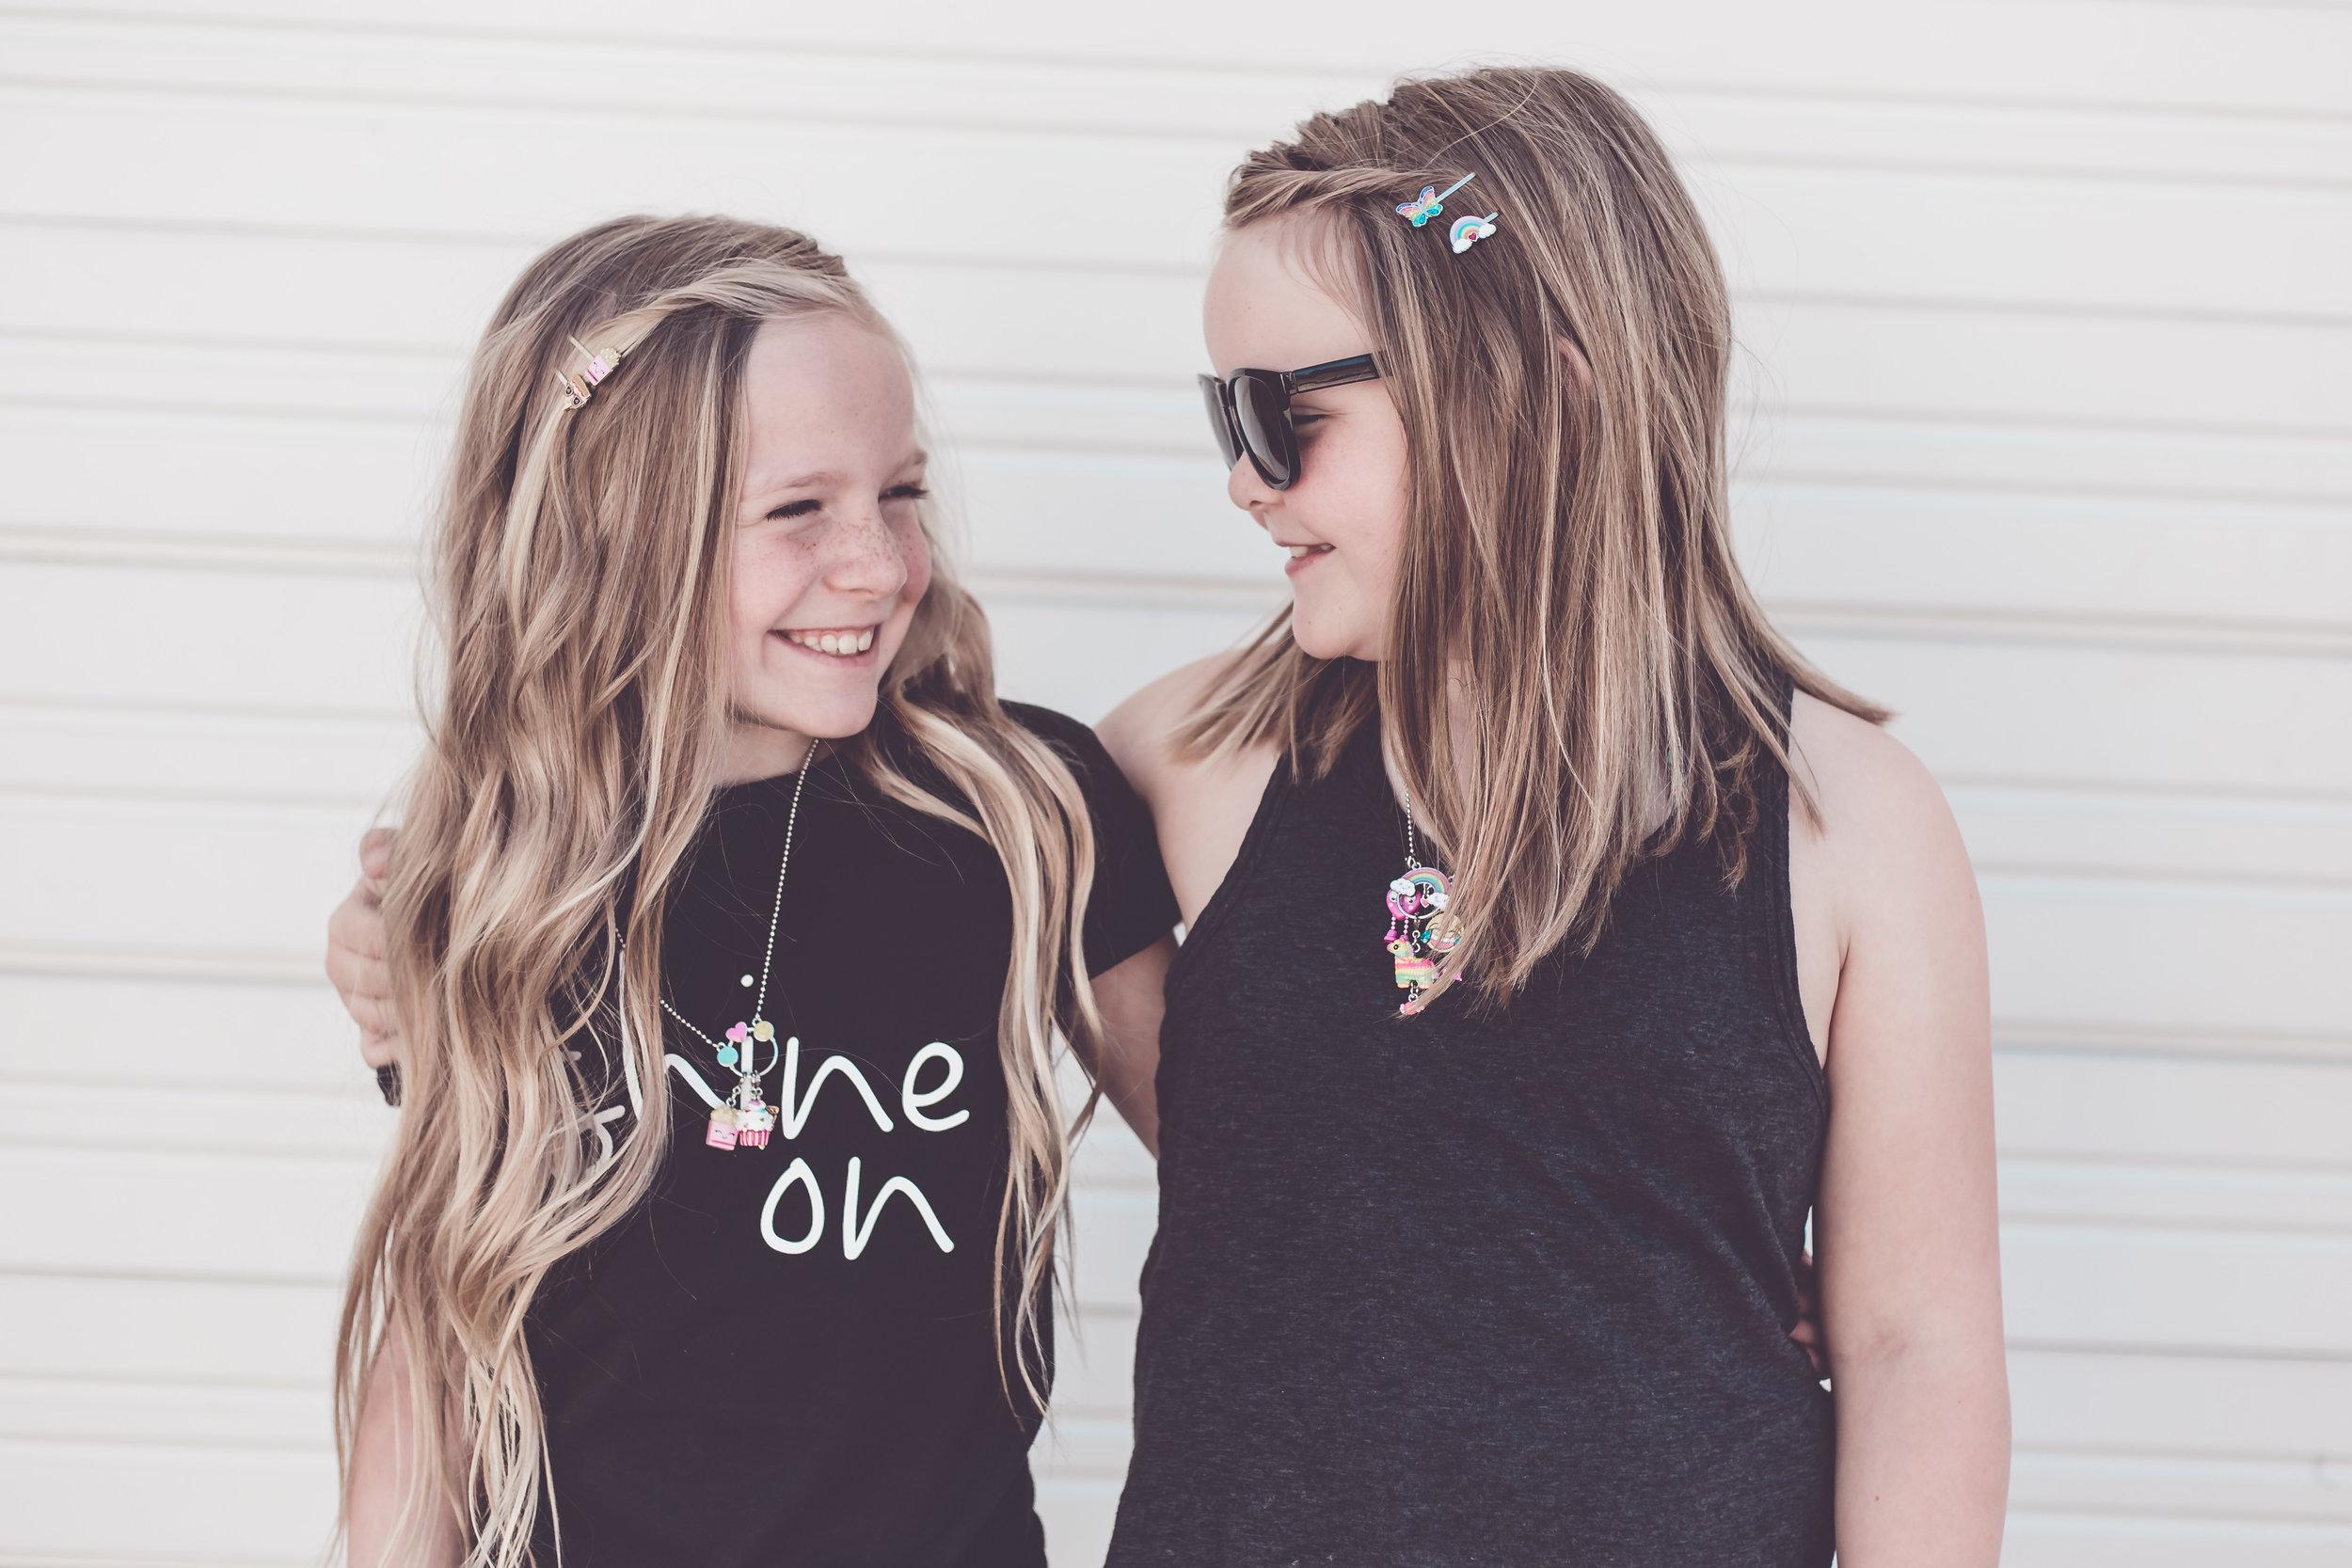 CharmIt_browntowngirls-1.jpg